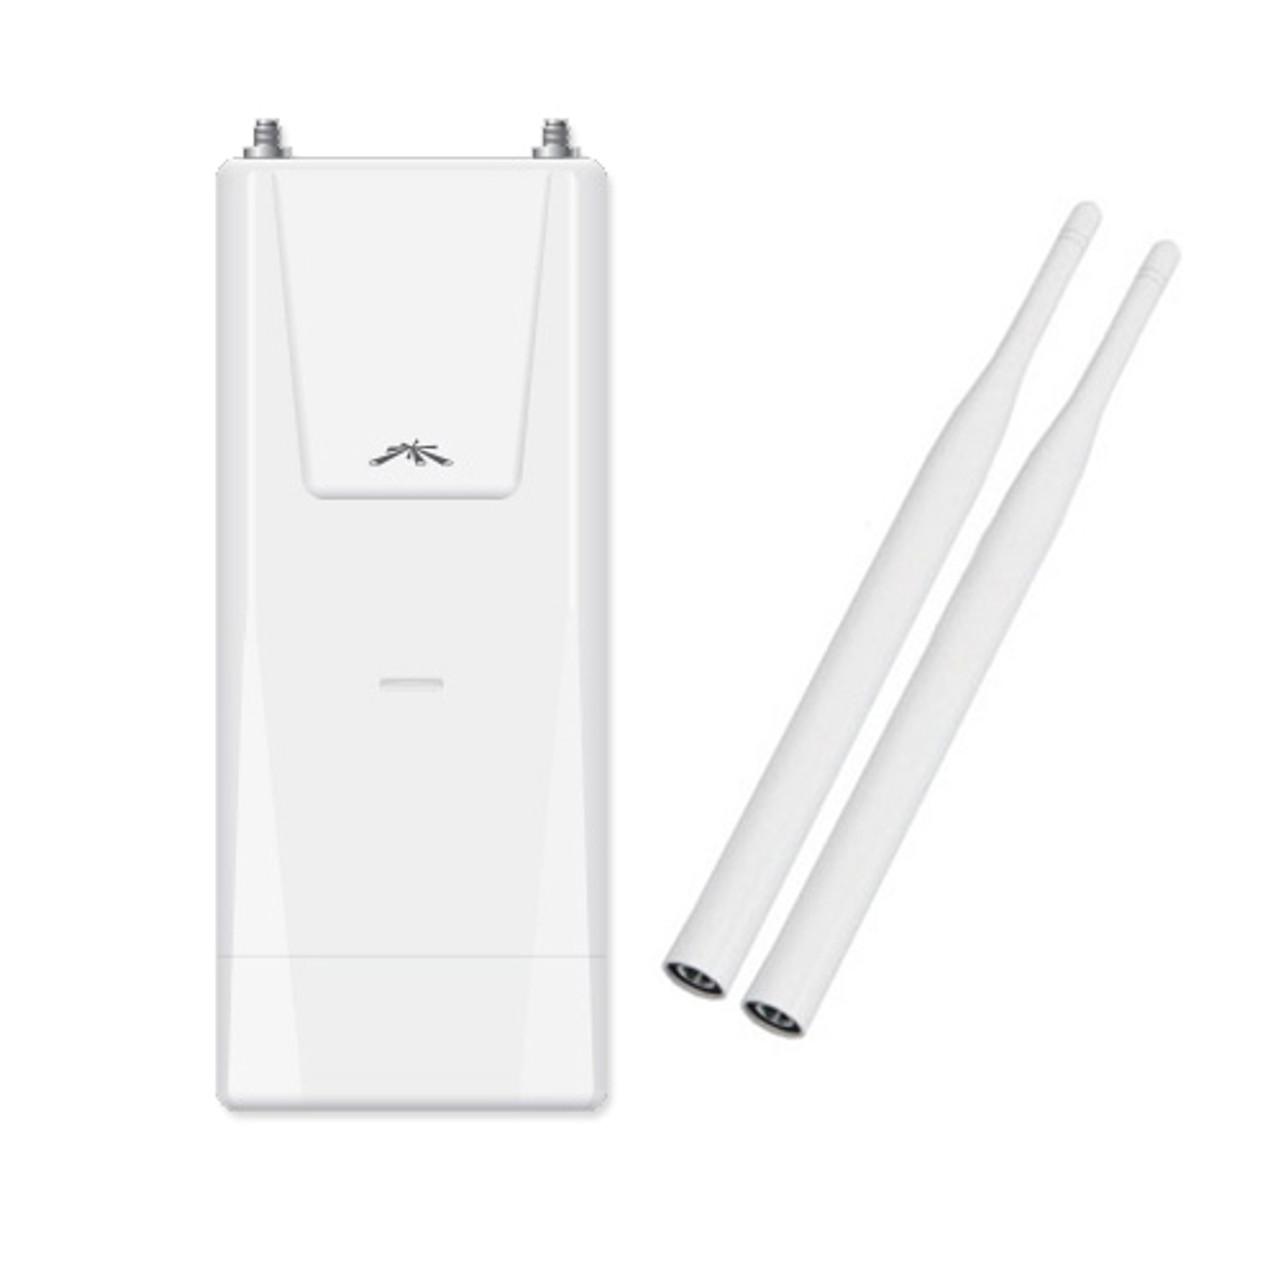 Ubiquiti UniFi UAP-Outdoor+ 2 4GHz 5dBi WiFi PoE Access Point 300Mbps N